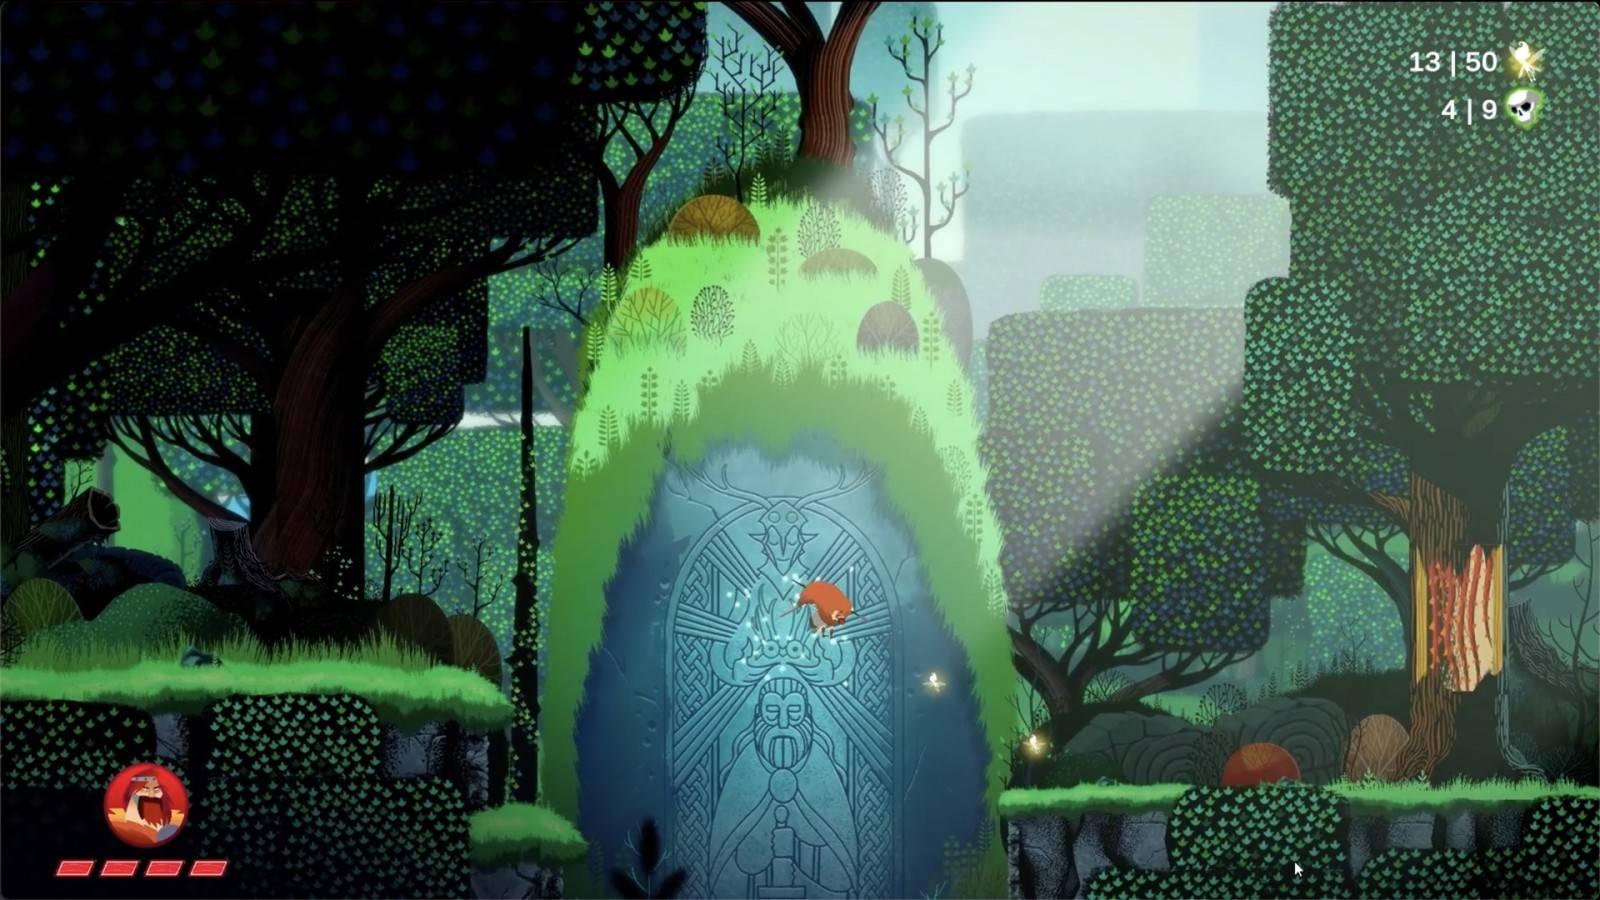 Clan O'Conall and the Crown of the Stag: El juego de plataforma llega a Steam 2